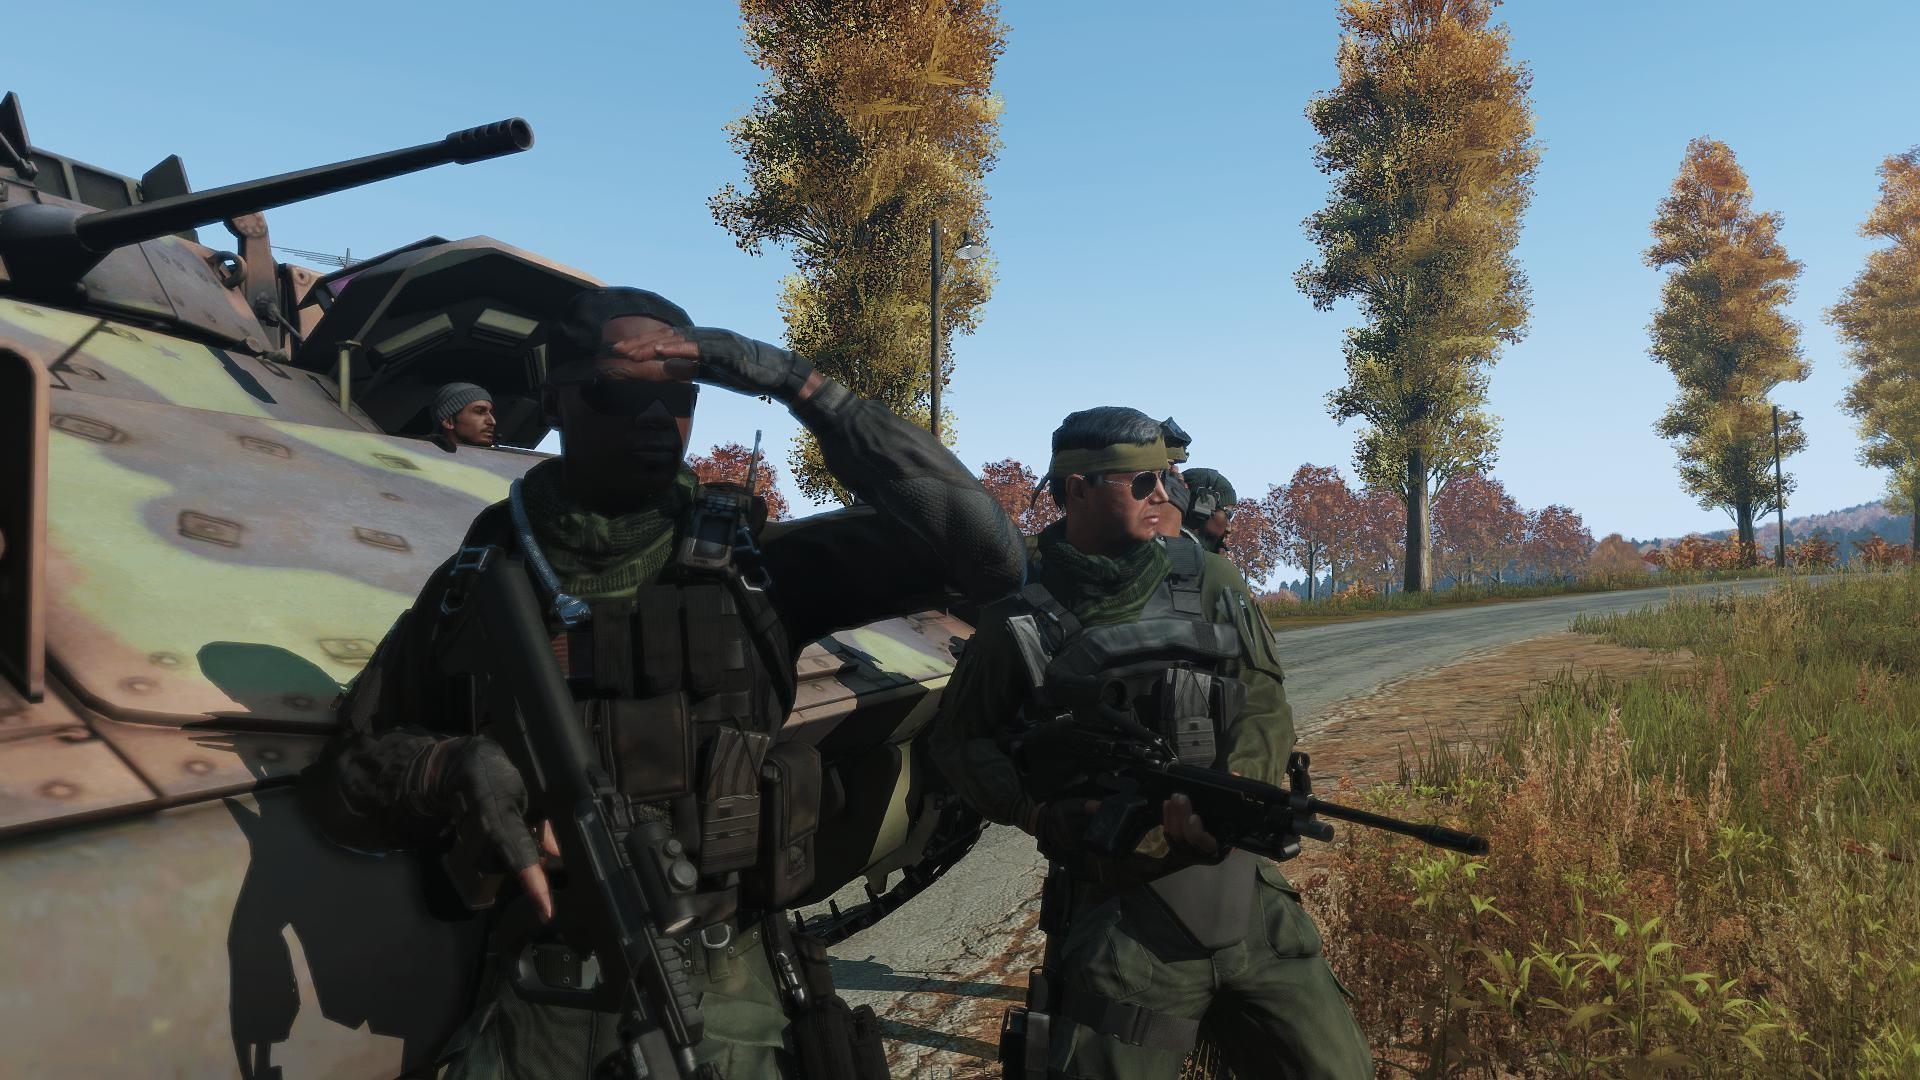 ArmA 3 Badass Squad Wallpapers